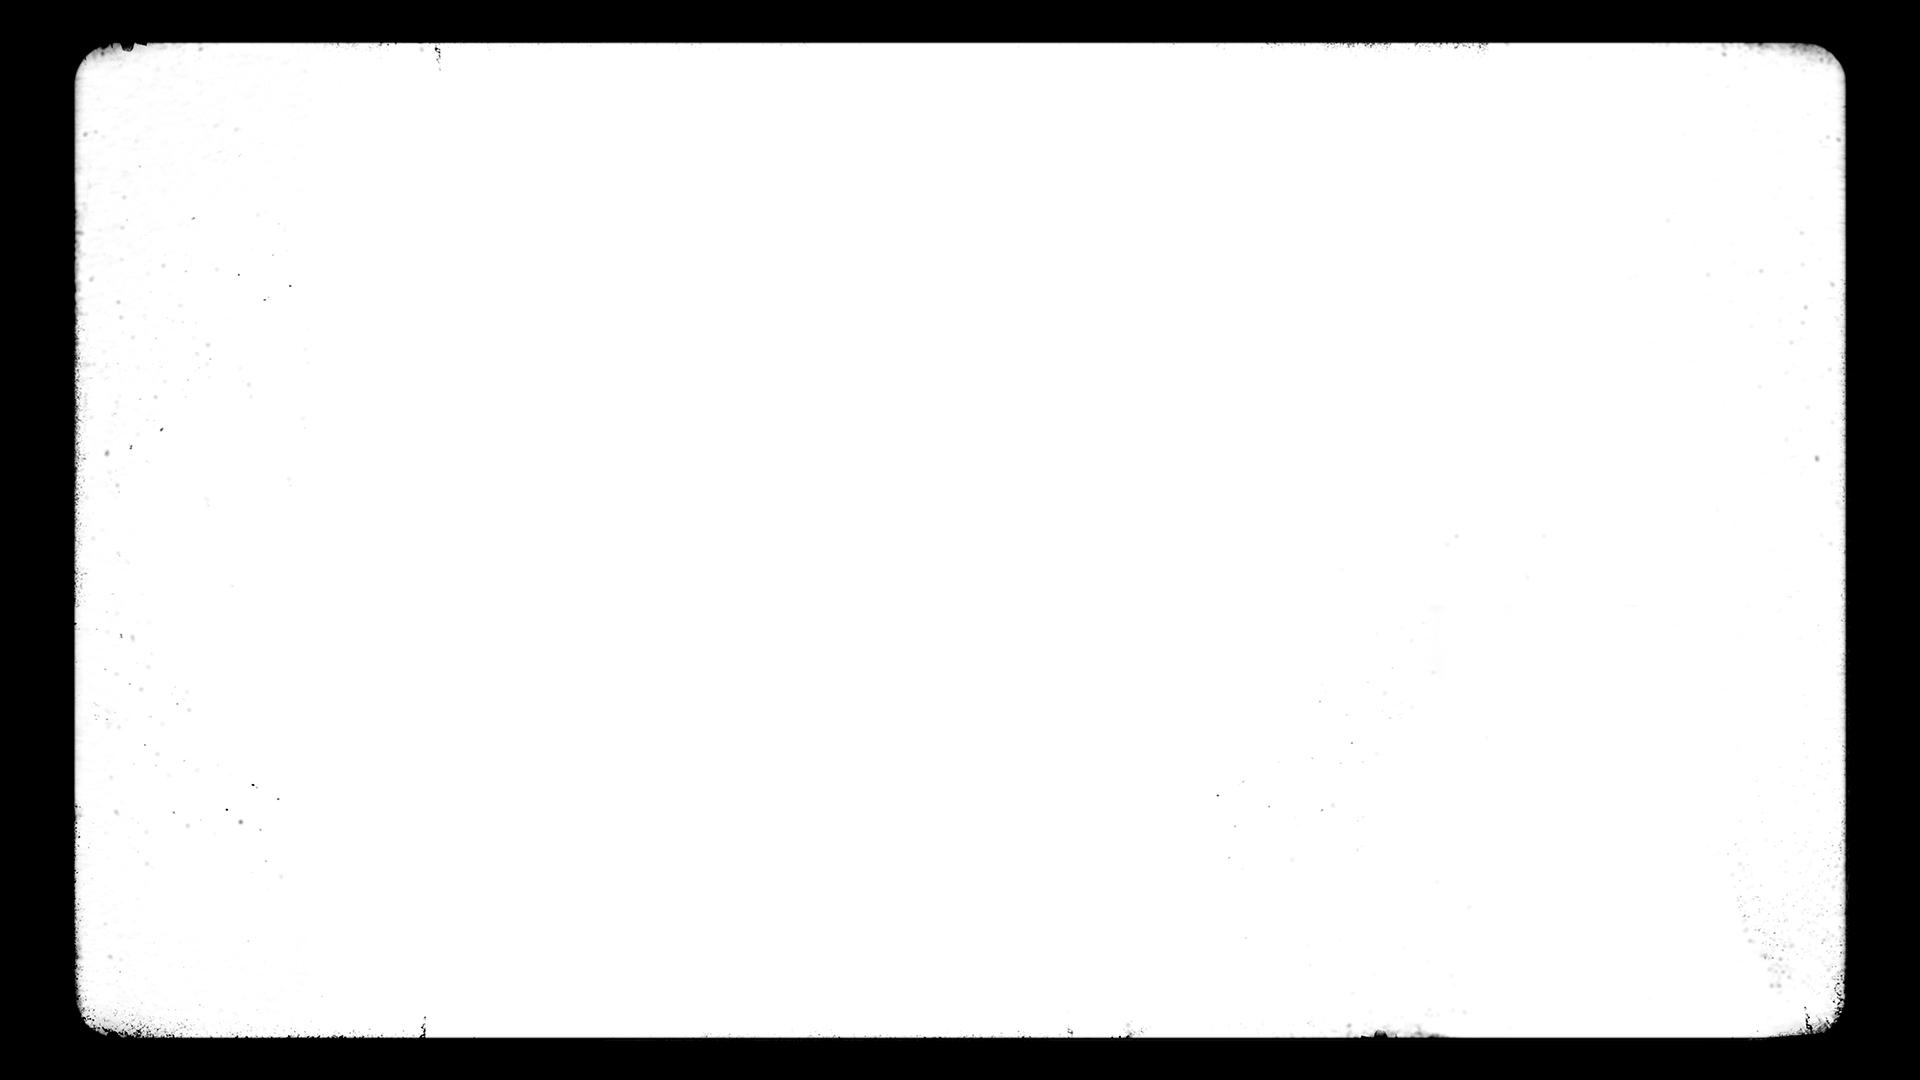 16x9B_Dirtier.jpg